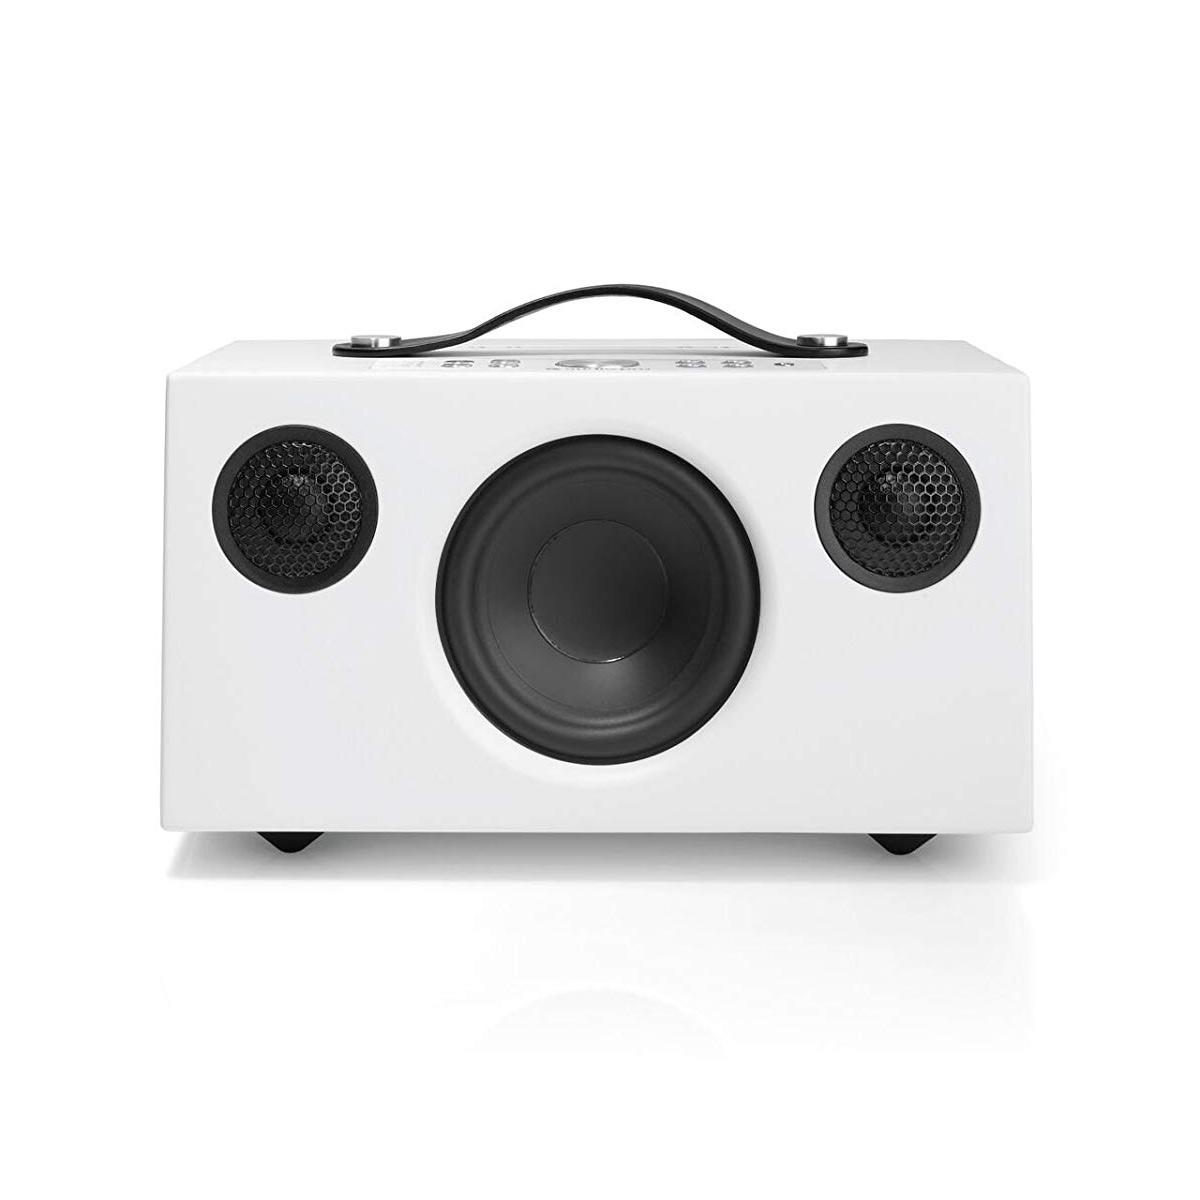 Image of Audio Pro Addon C5A Wireless Multiroom Smart Speaker with Alexa in White